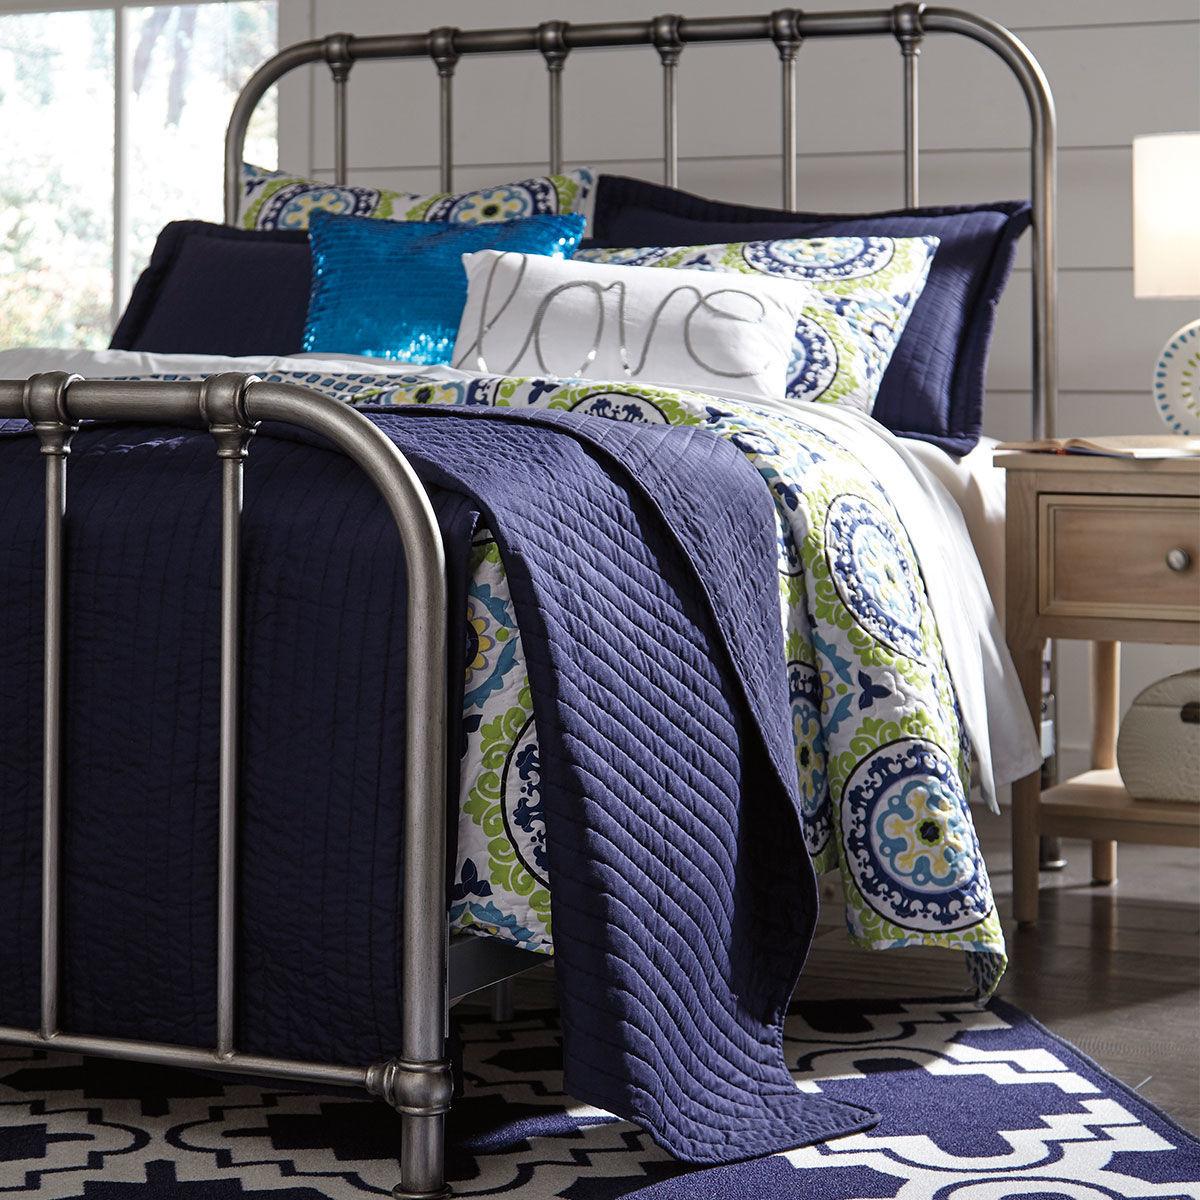 Picture of NASHVILLE FULL METAL BED